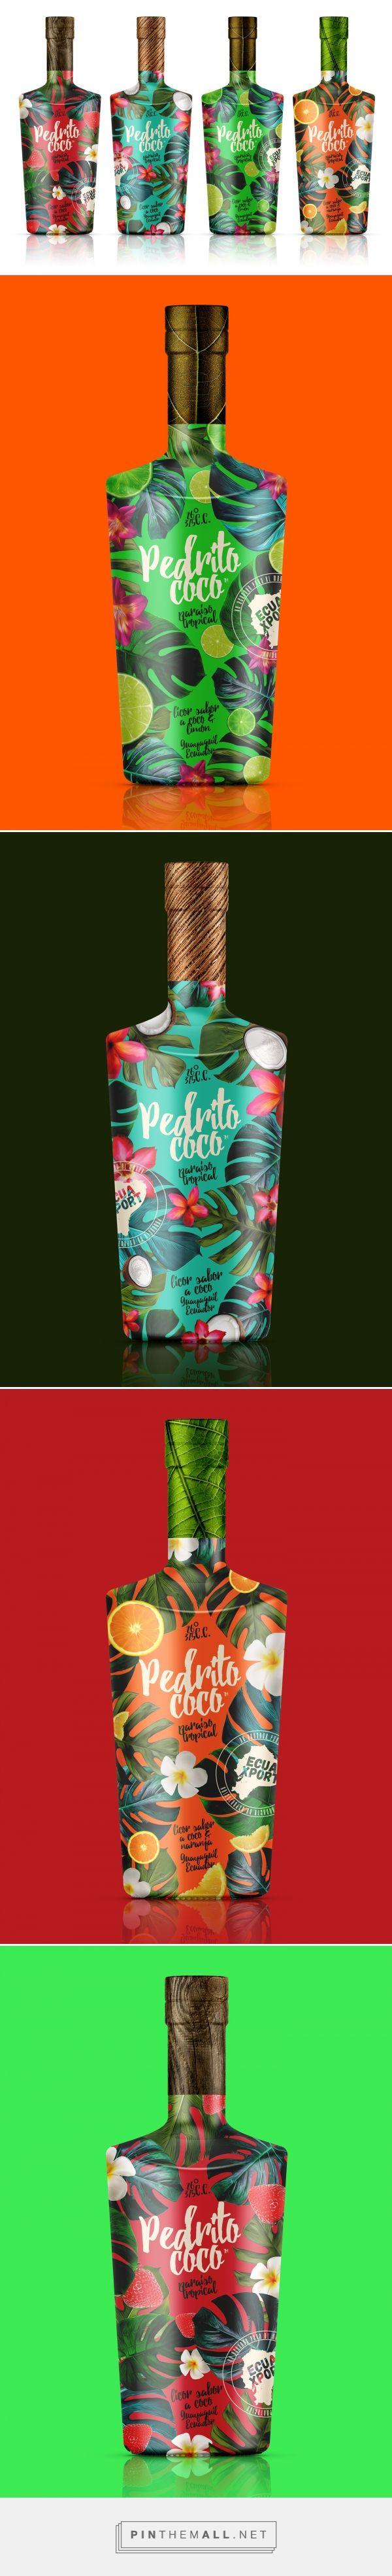 Pedrito Coco Spirits Packaging by Pulsum Brands | Fivestar Branding – Design and Branding Agency & Inspiration Gallery